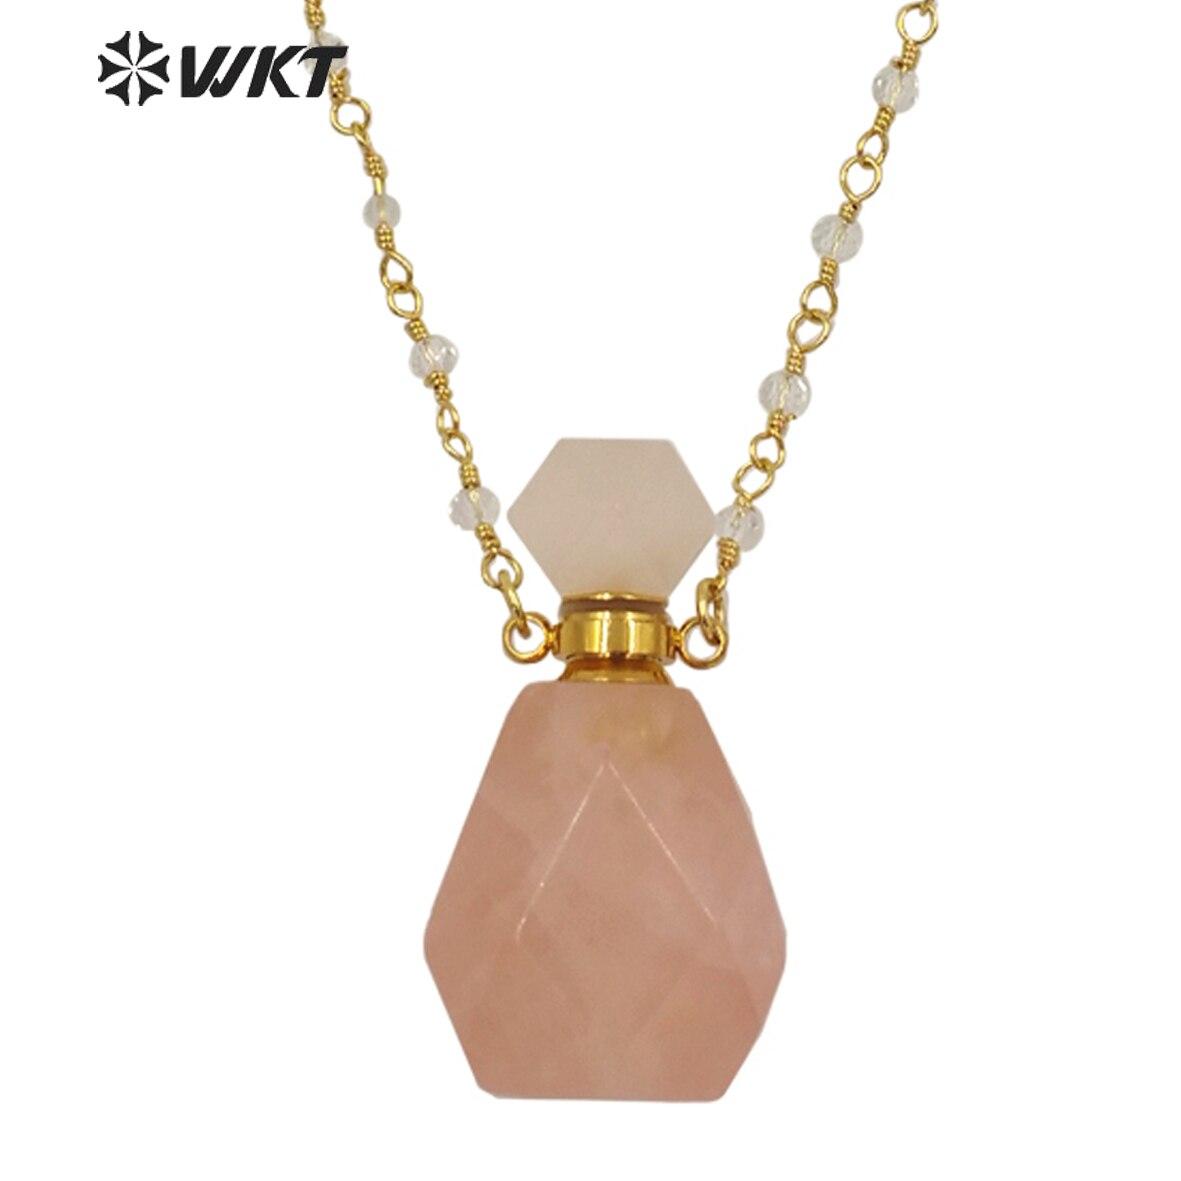 WT-N1269 الجملة سيدة حجر الميلاد عطر زجاجة قلادة الذهب الفولاذ المقاوم للصدأ المعادن الورود الكوارتز حجر زجاجة قلادة